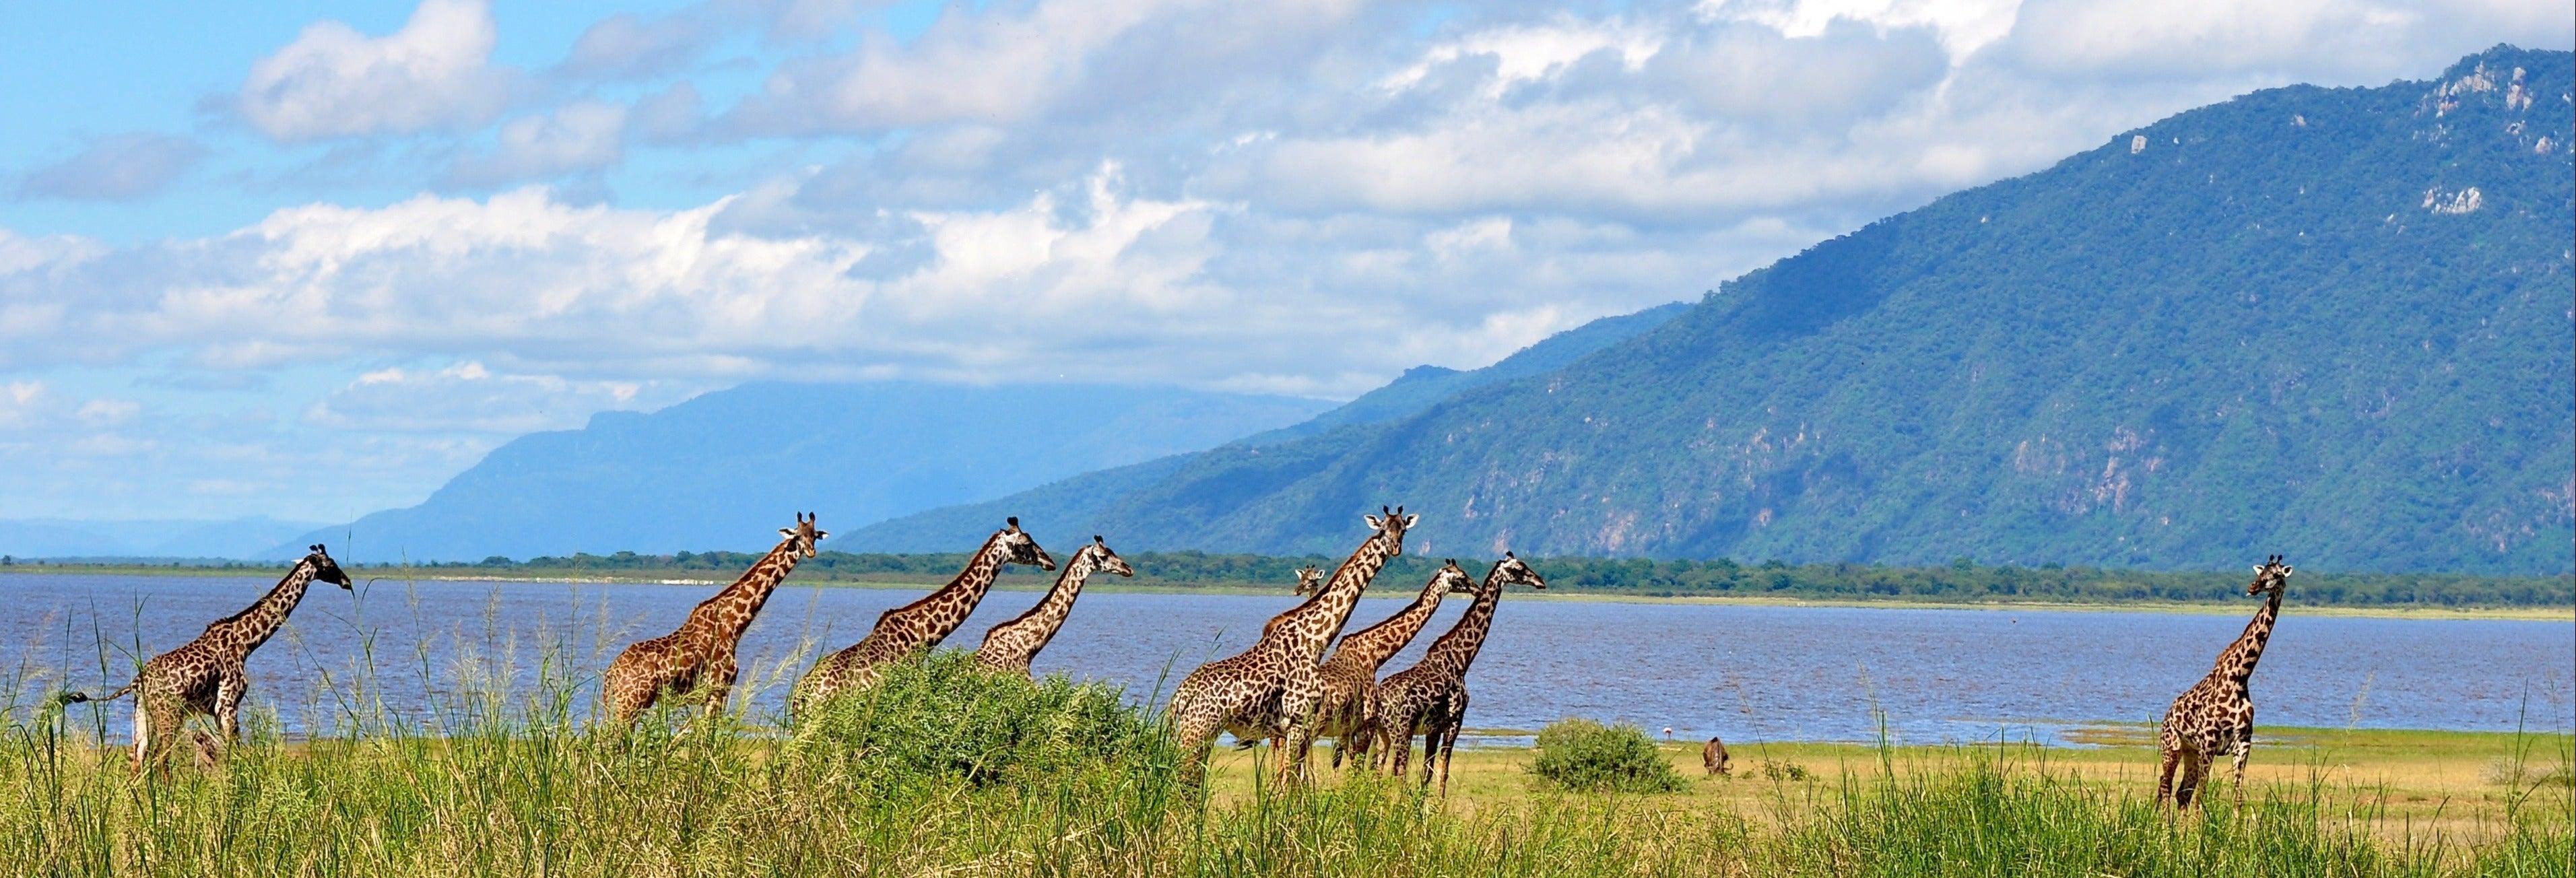 Safari por el Lago Manyara